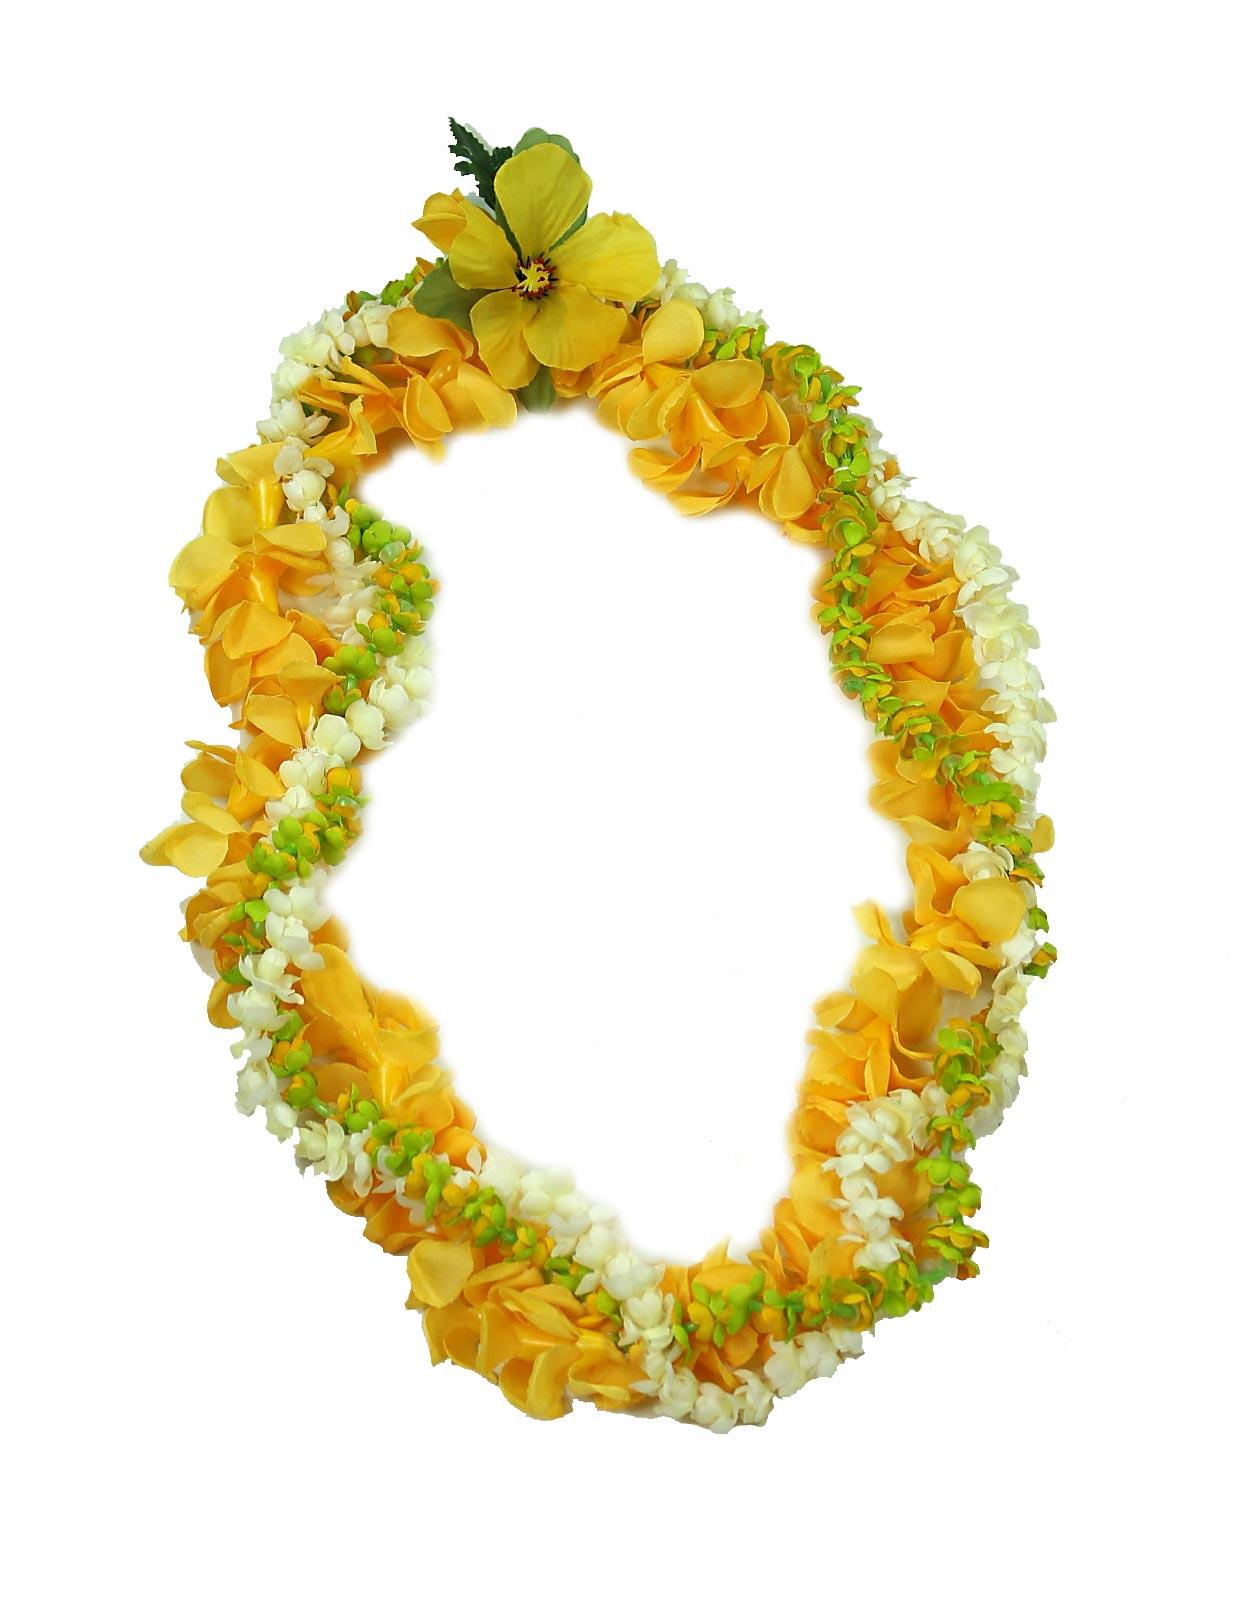 Leis from hawaii headbands anklets shaka time hawaii pakalana pikake puakenikeni twirl silk flower lei izmirmasajfo Images